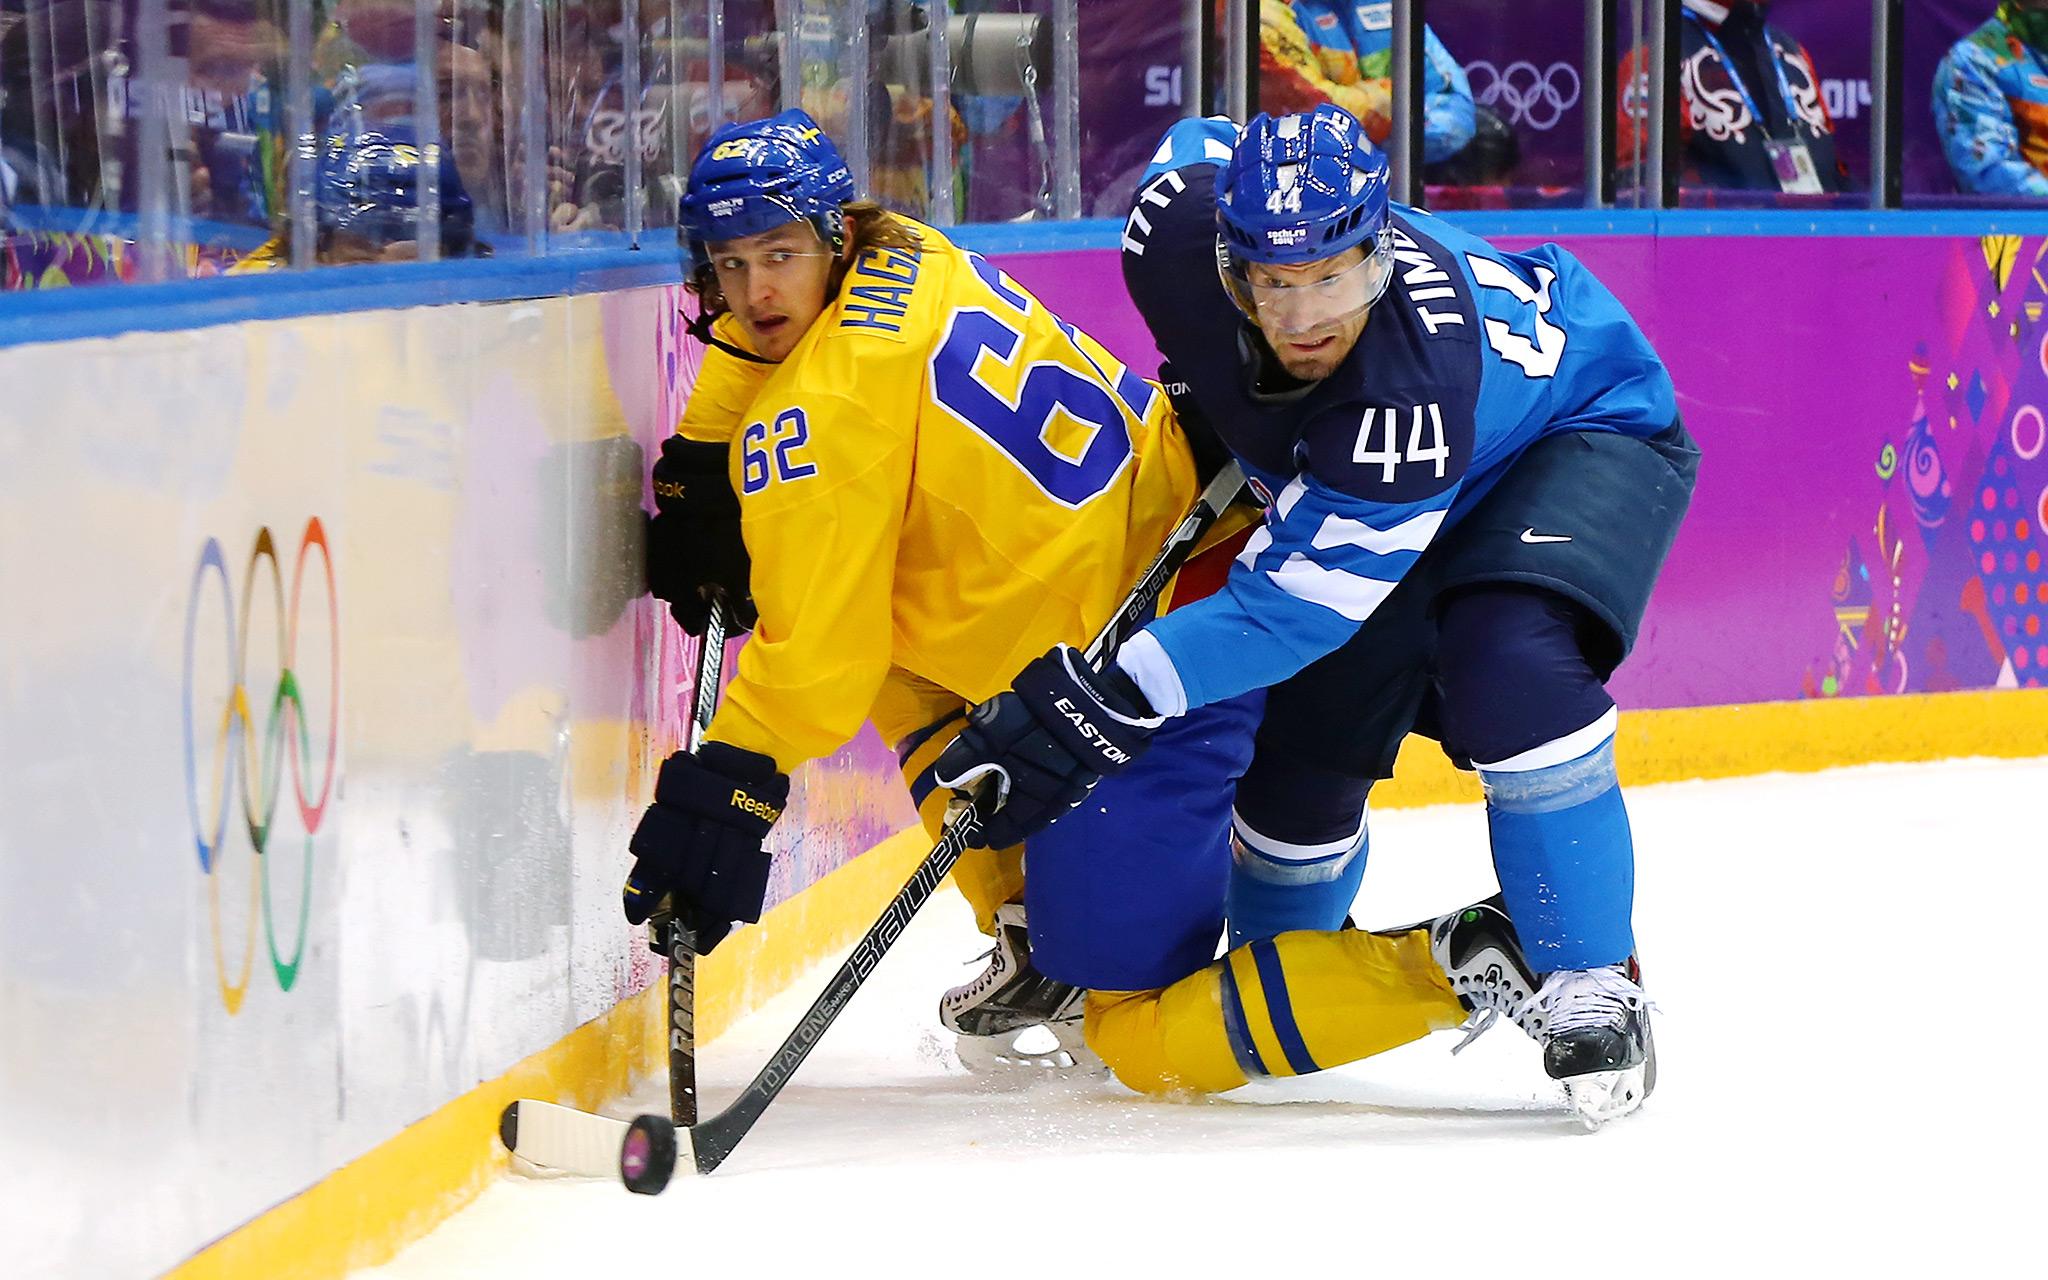 Men's Hockey Semifinal - Sweden vs. Finland - Sochi ...